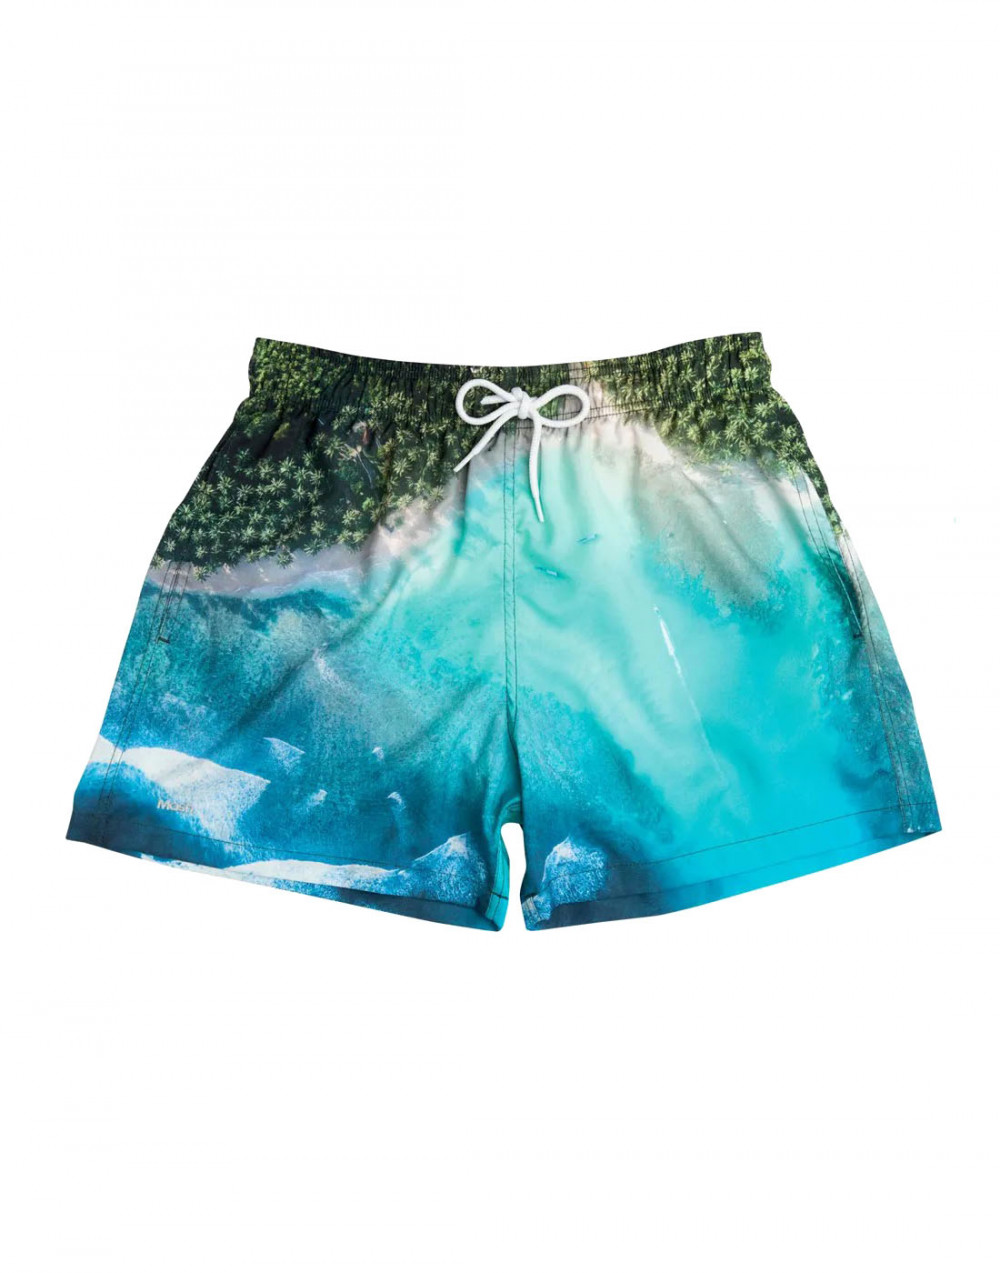 Shorts Praia Curto Estampada Paisagem Verde Mash